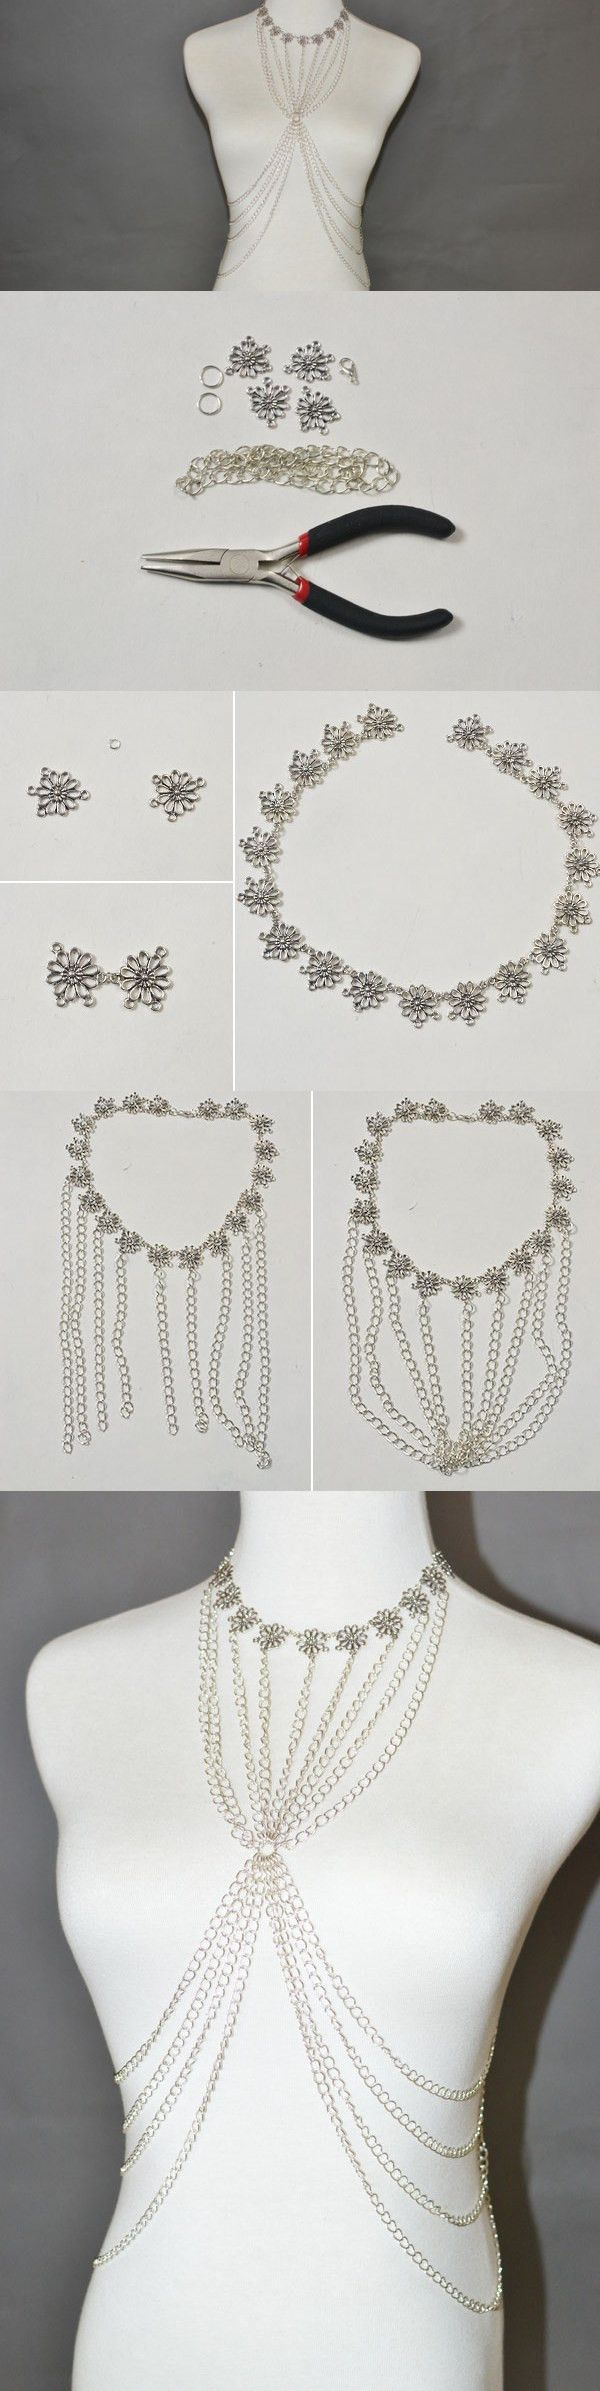 DIY Handmade Flower Body Jewelry with Chain #tutorial #bodyjewelry #pandahall